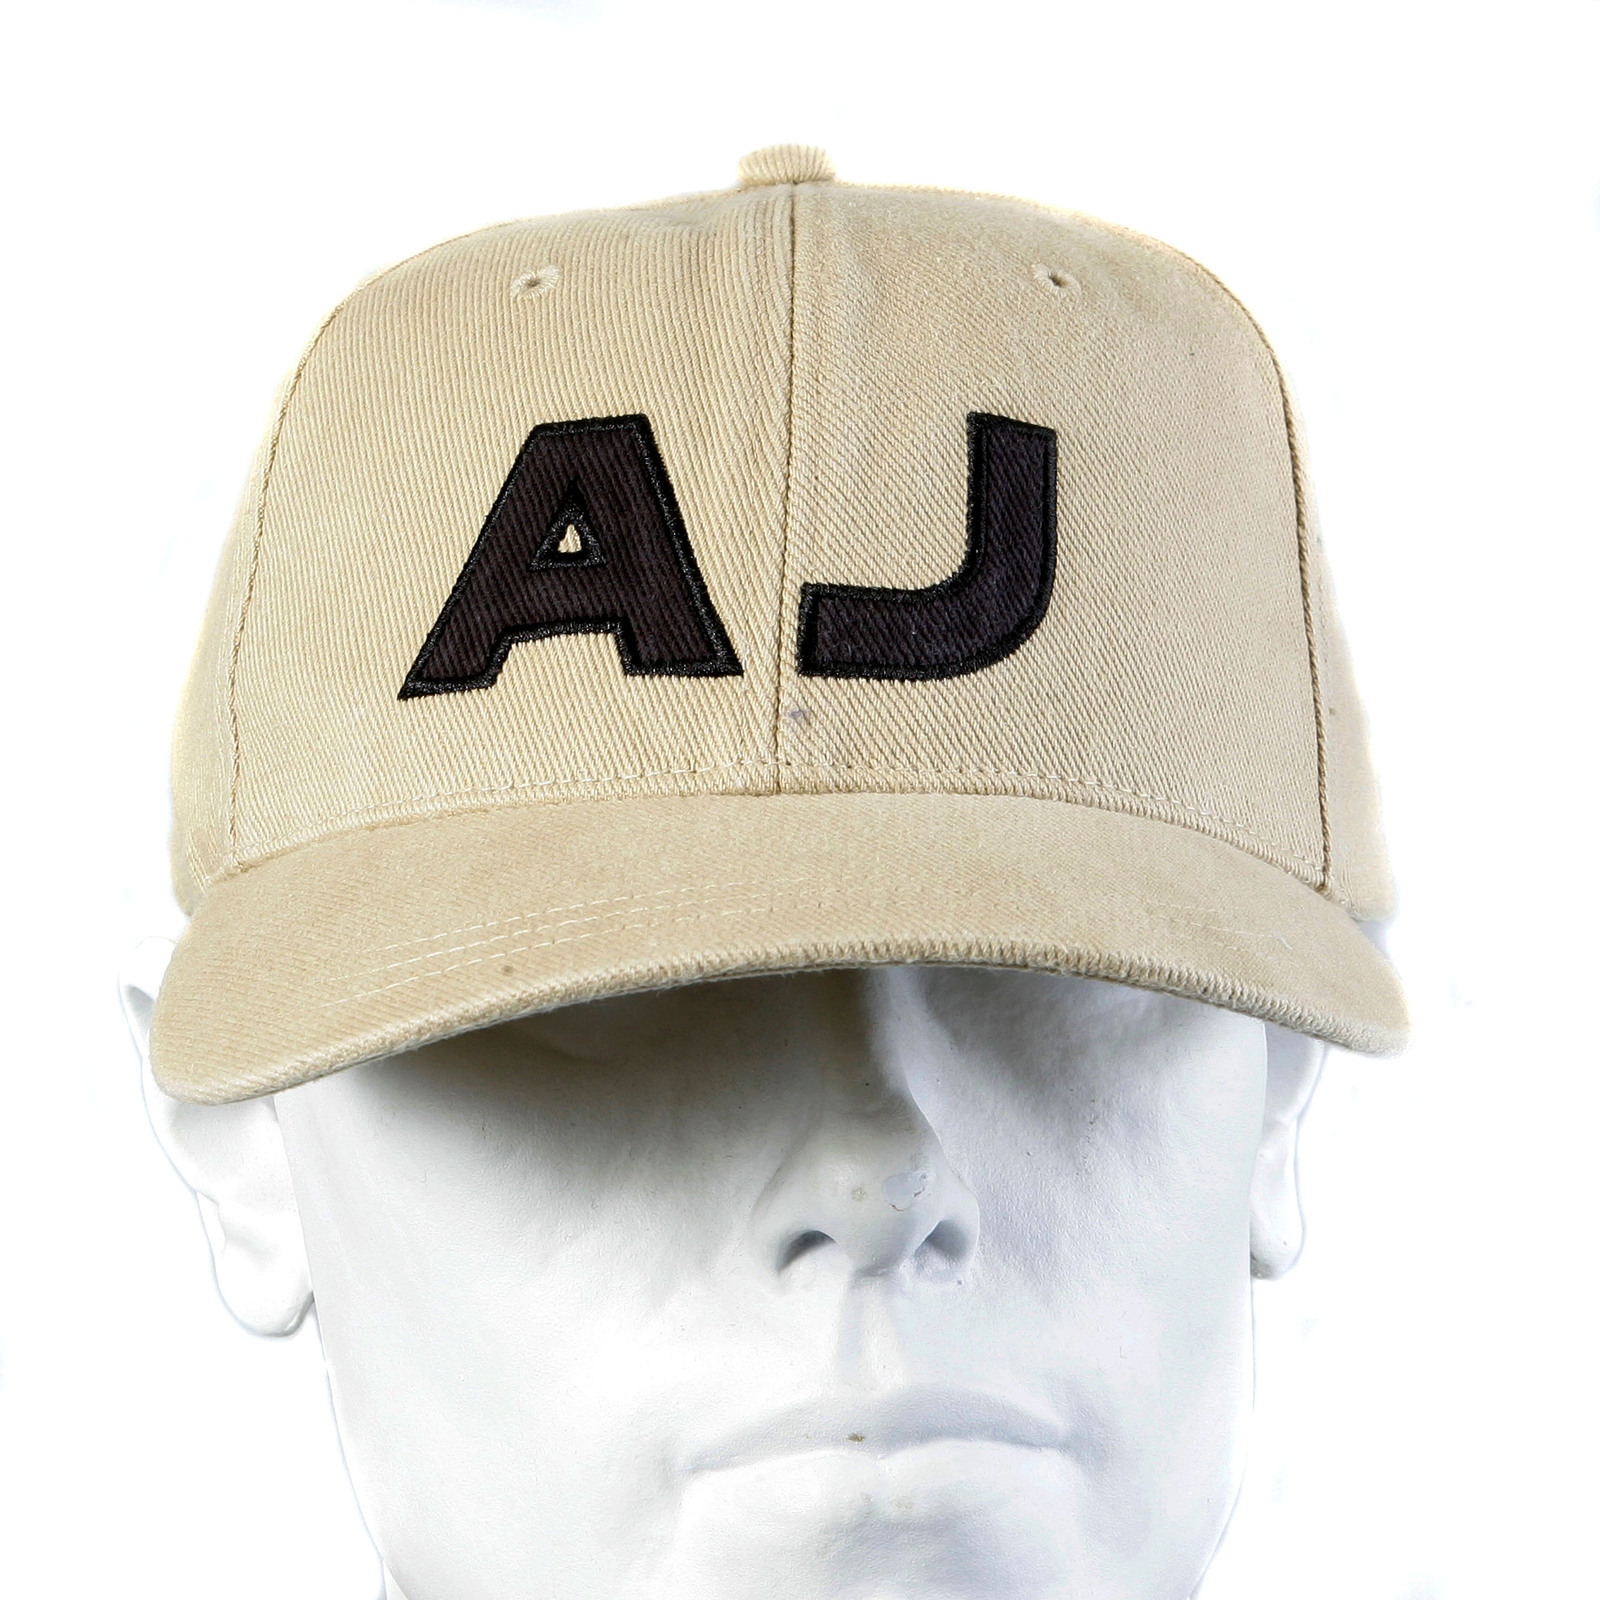 7ced976e6fb Armani Jeans Cap 0648OXE Stone cap AJM7516 at Togged Clothing